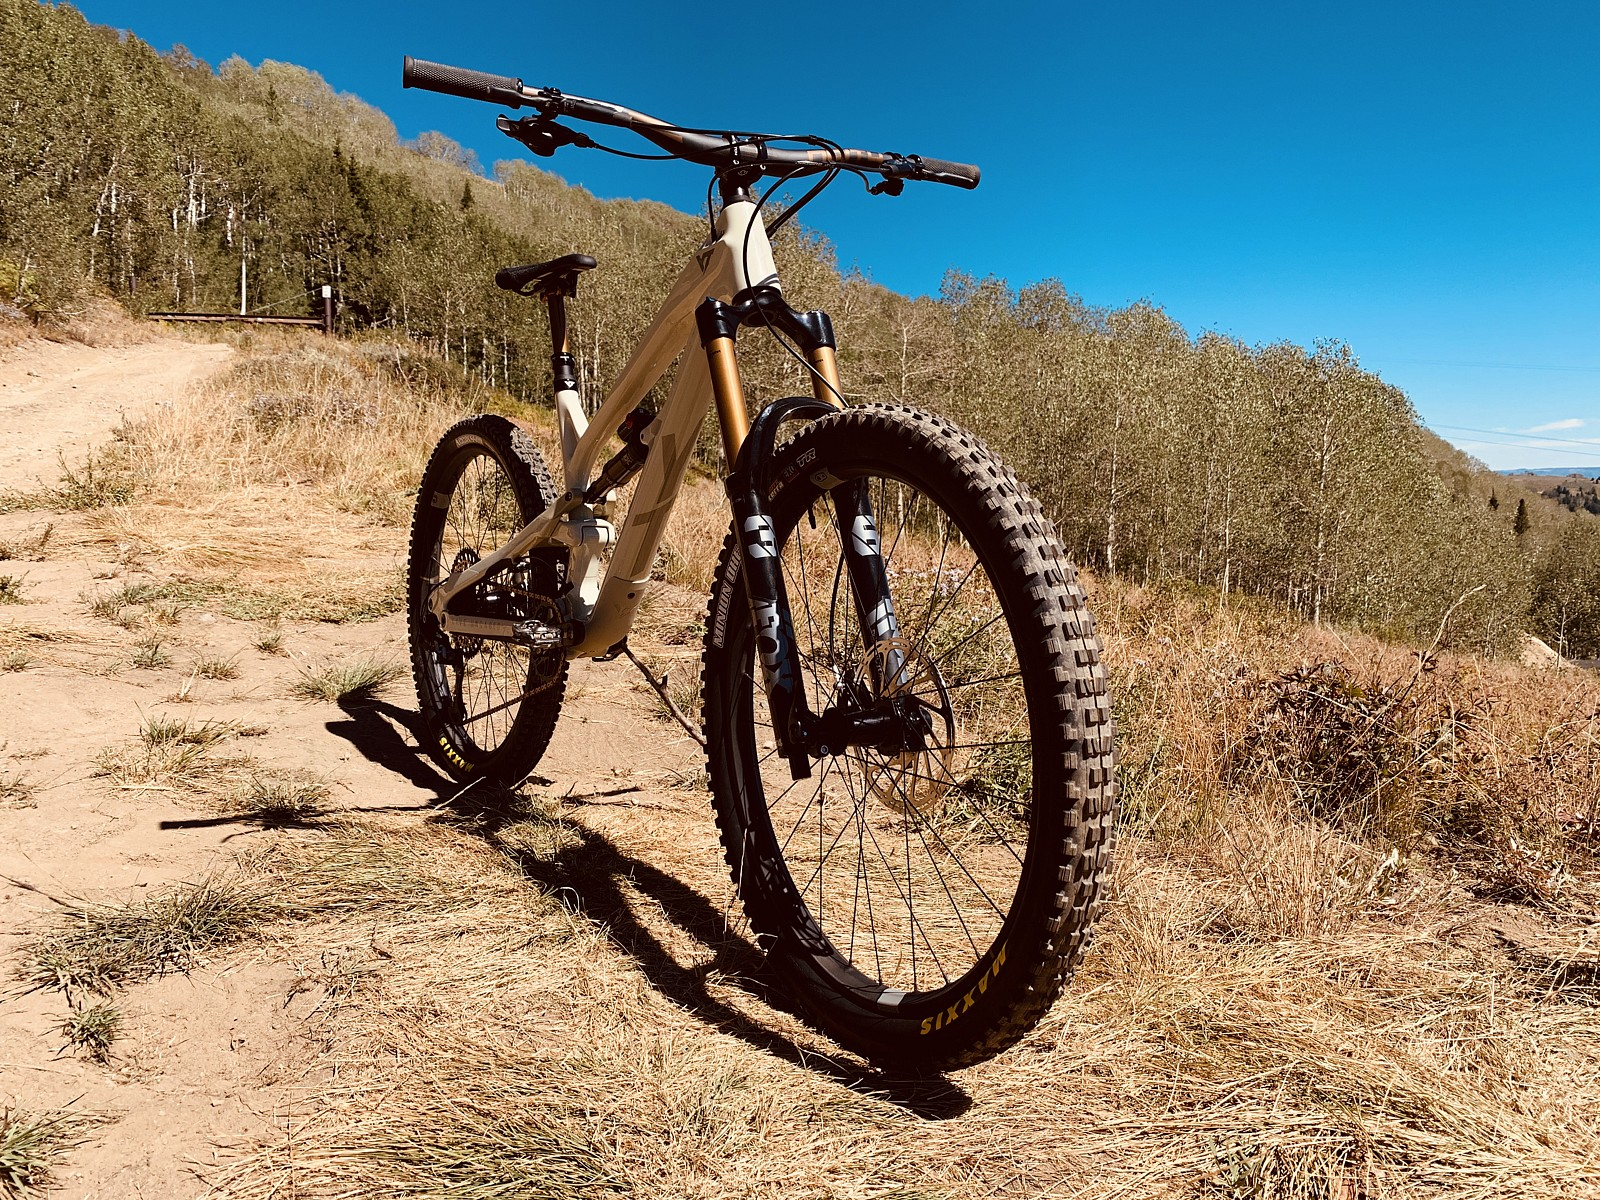 IMG E0199 - jaykalafatis - Mountain Biking Pictures - Vital MTB